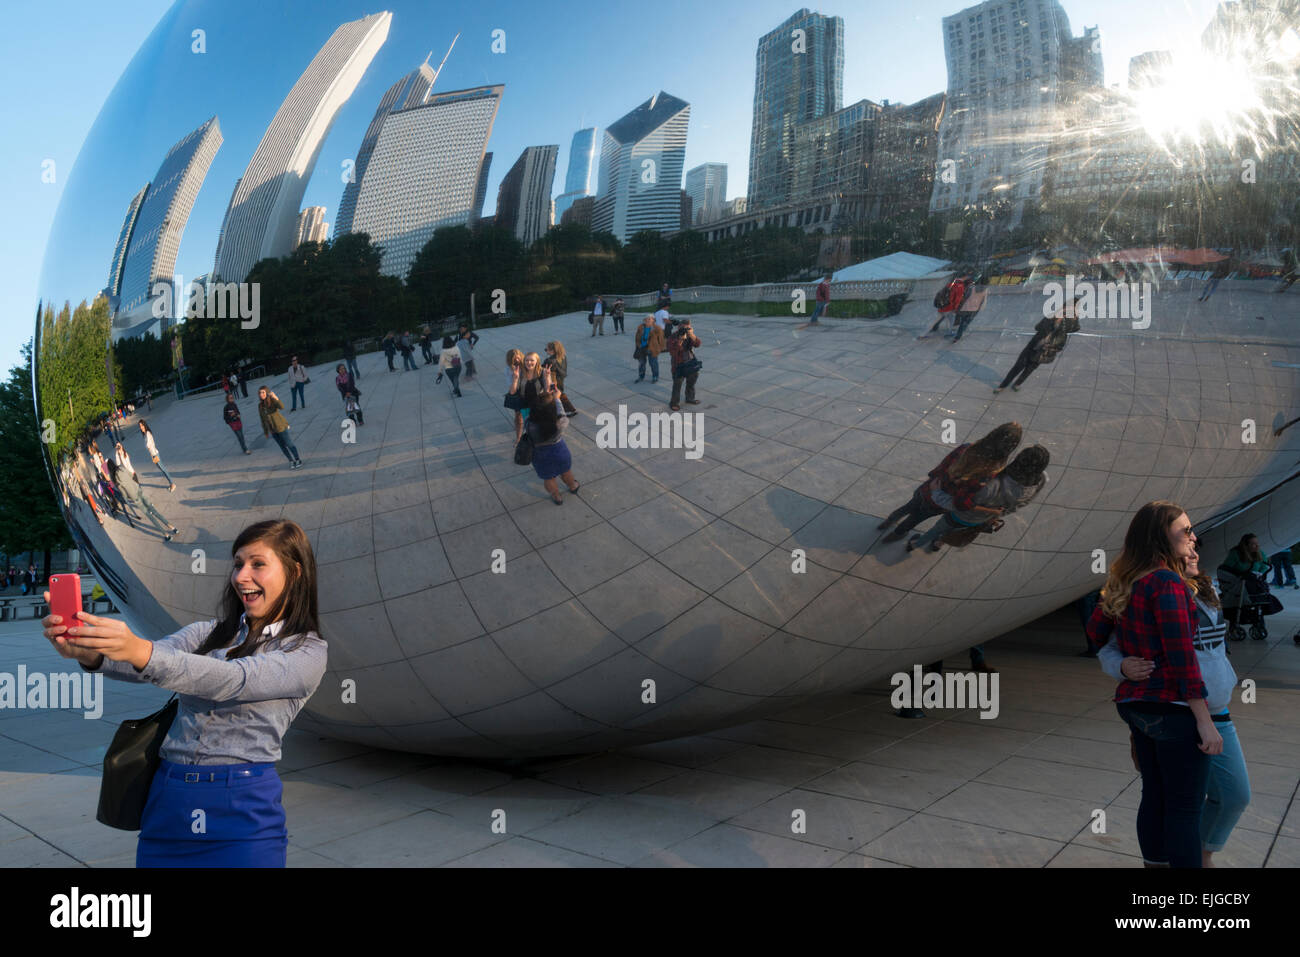 The Cloud Gate sculpture by Anish Kapoor. Millennium Park. Chicago. illinois. USA. - Stock Image